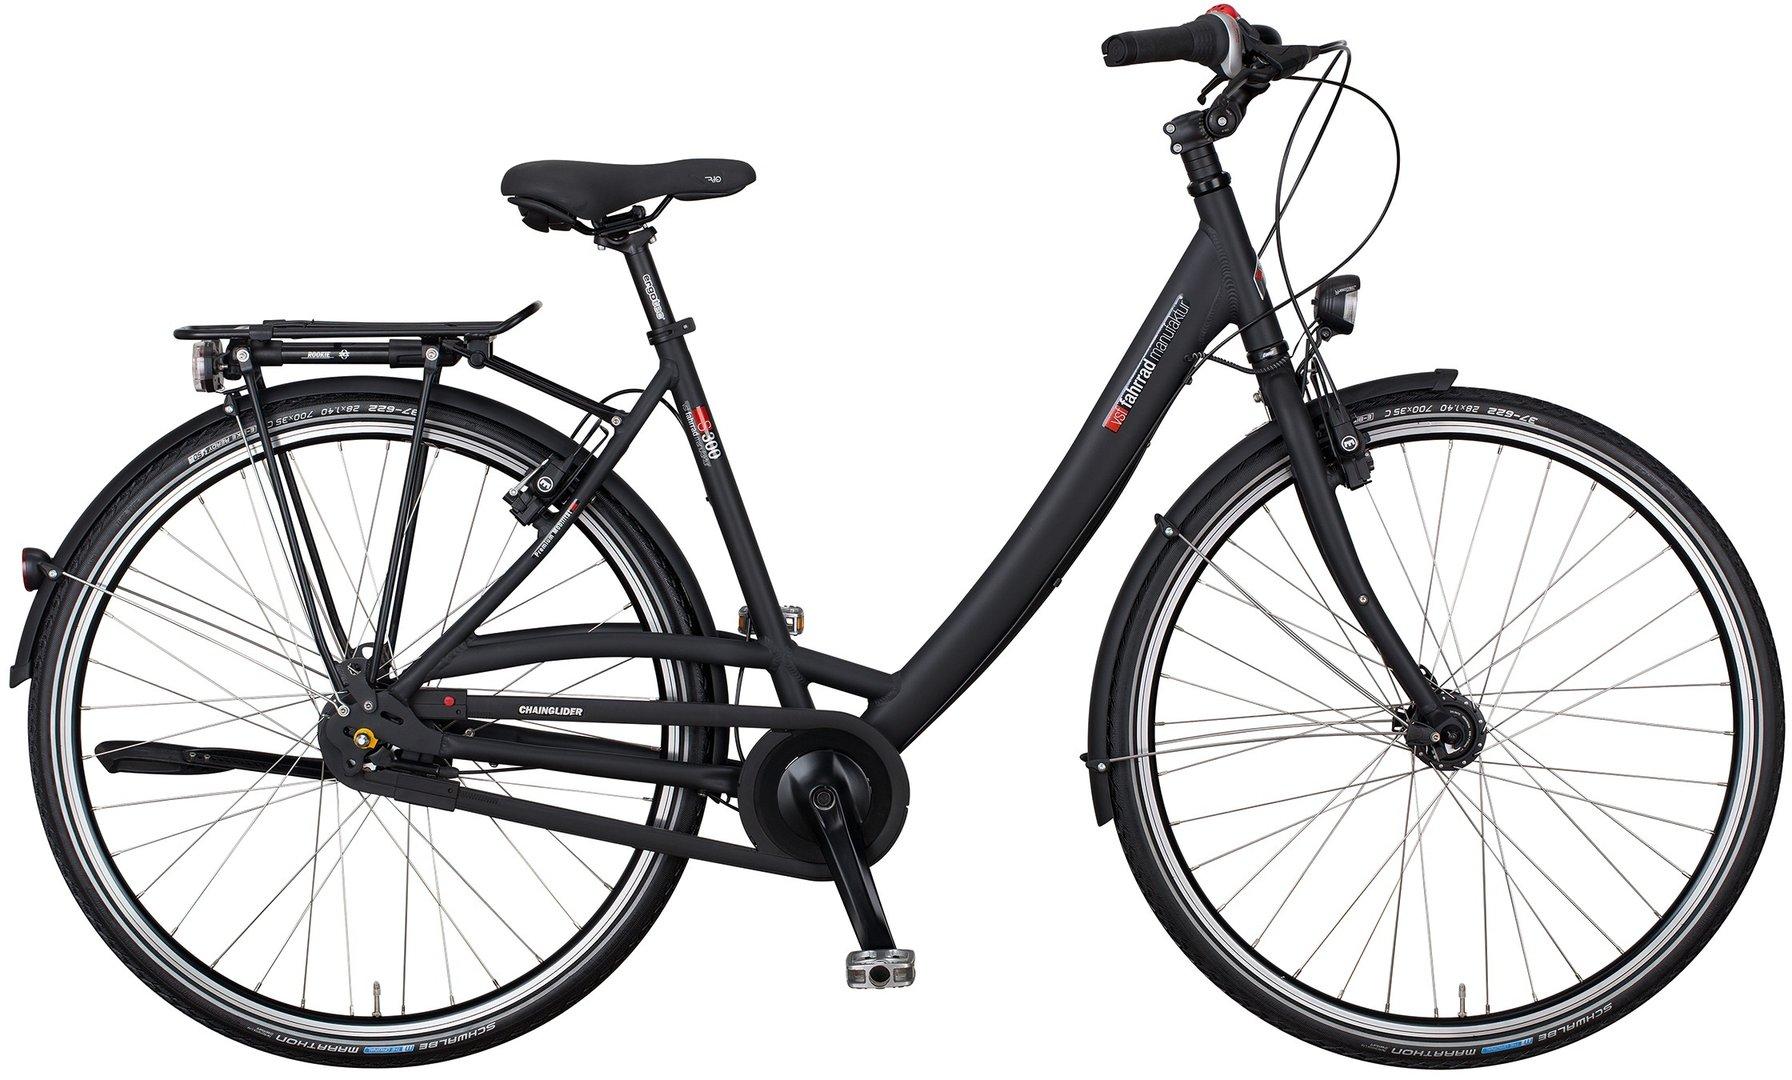 Vsf Fahrradmanufaktur S 300 8 G Nexus Fl Hs11 City Bike